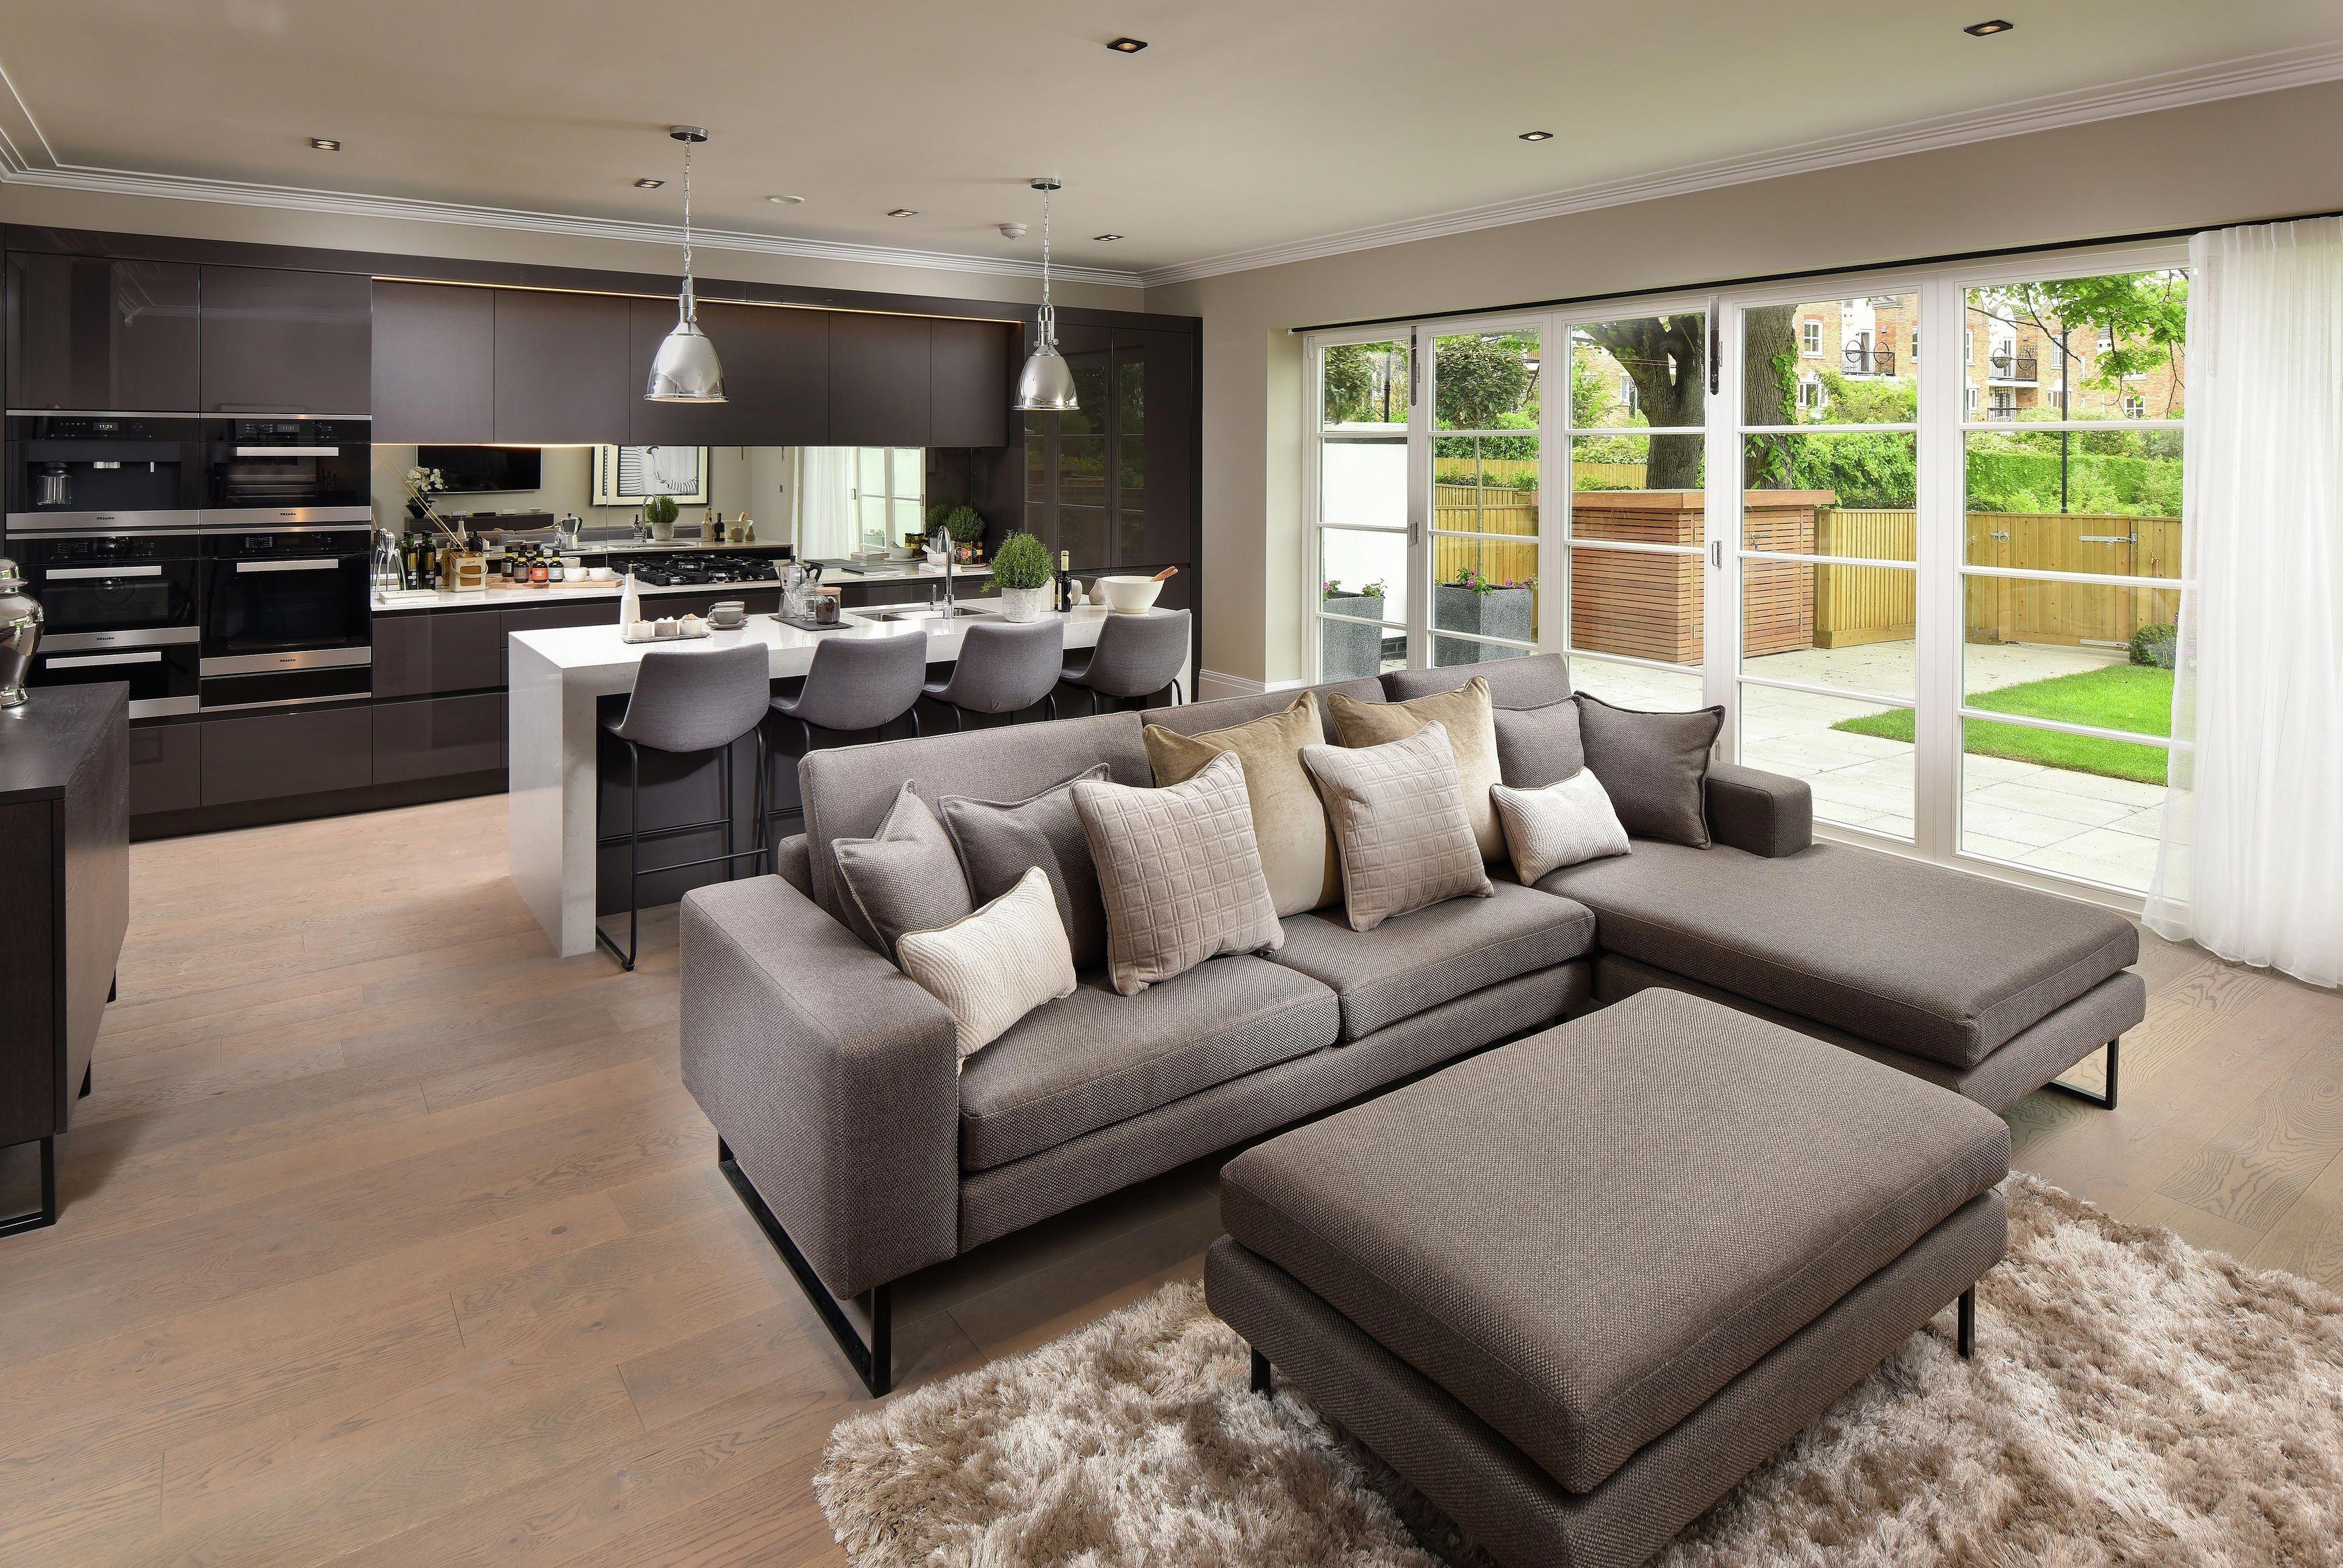 Open Plan Living Is Desirable For New Homes The Large Open Floor Space And Fewer Walls At Sala De Estar E Cozinha Integradas Design De Casa Cozinhas Modernas